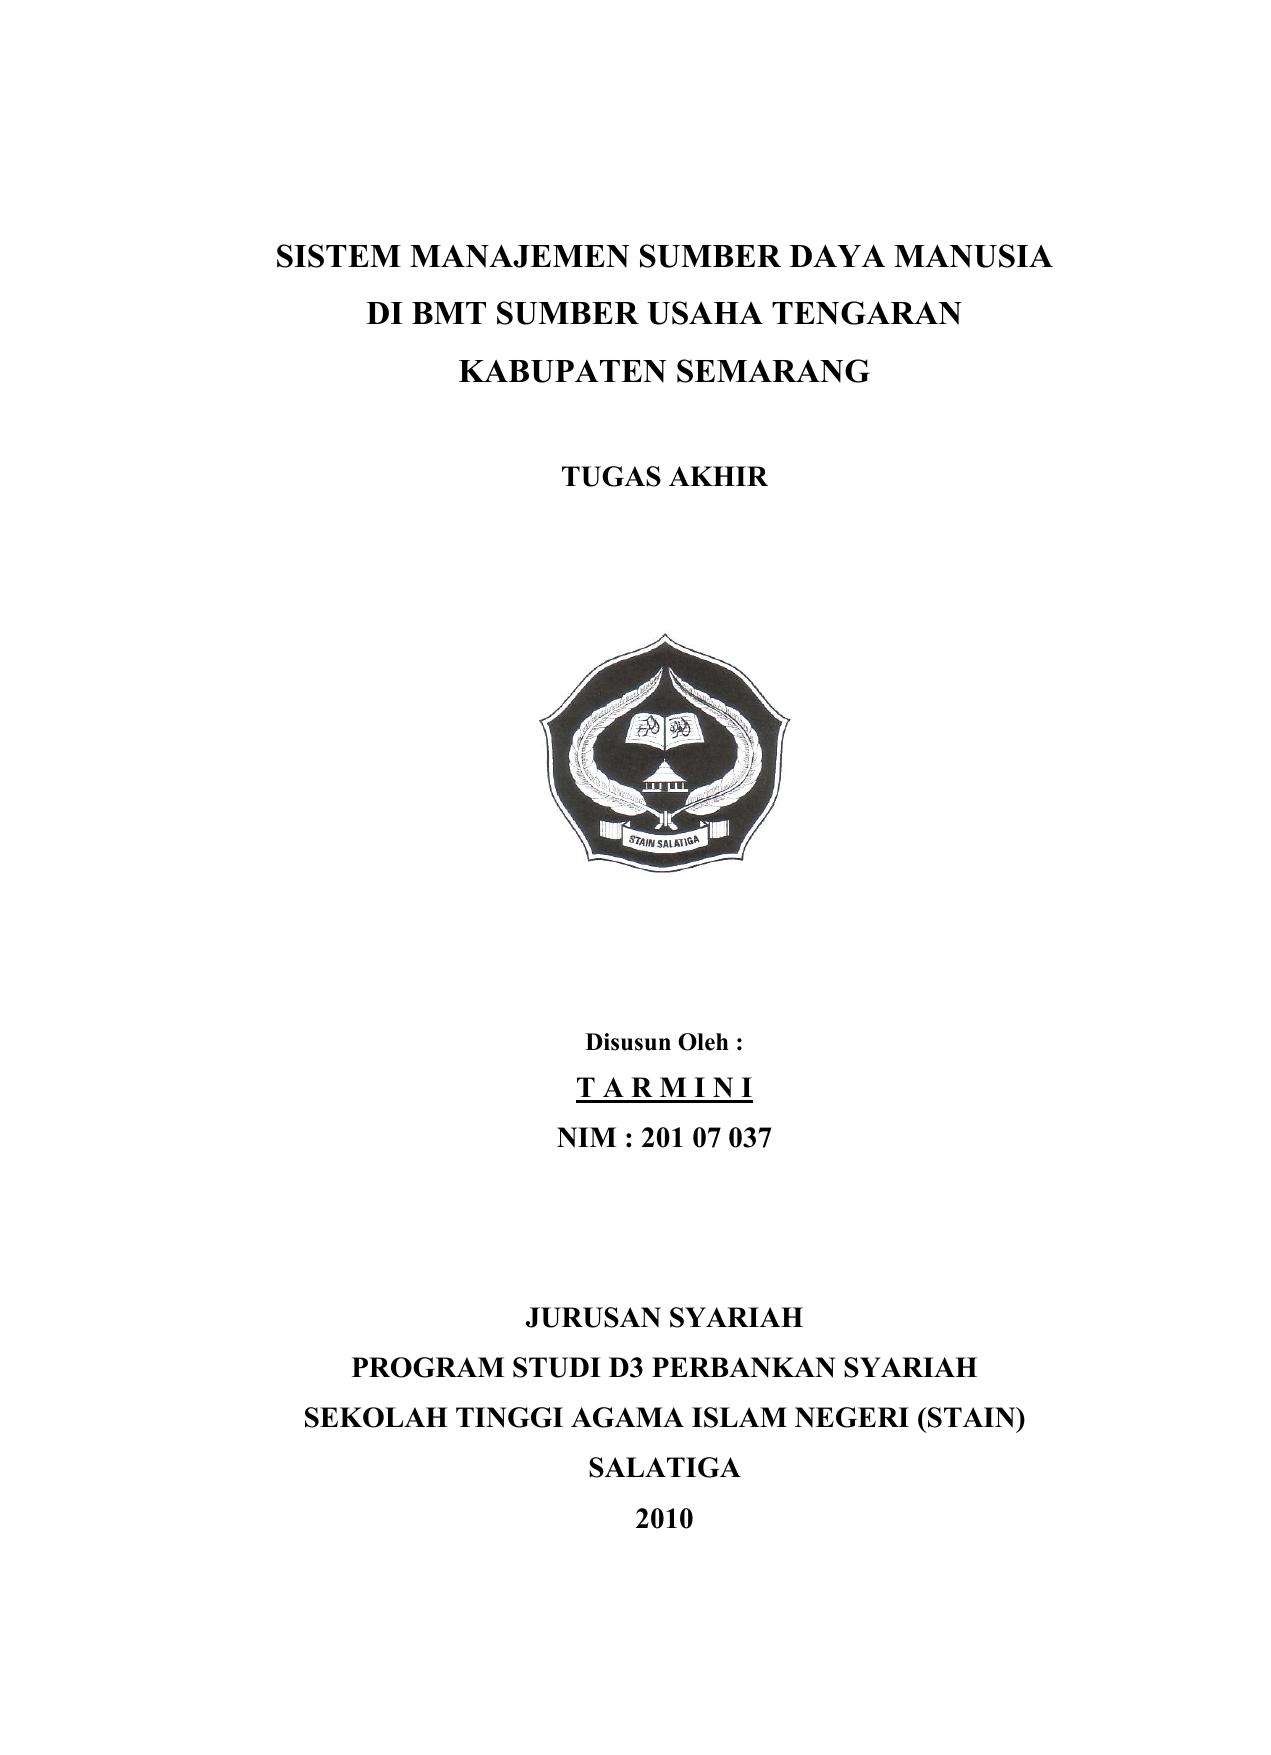 Contoh Judul Laporan Pkl Manajemen Keuangan Kumpulan Contoh Laporan